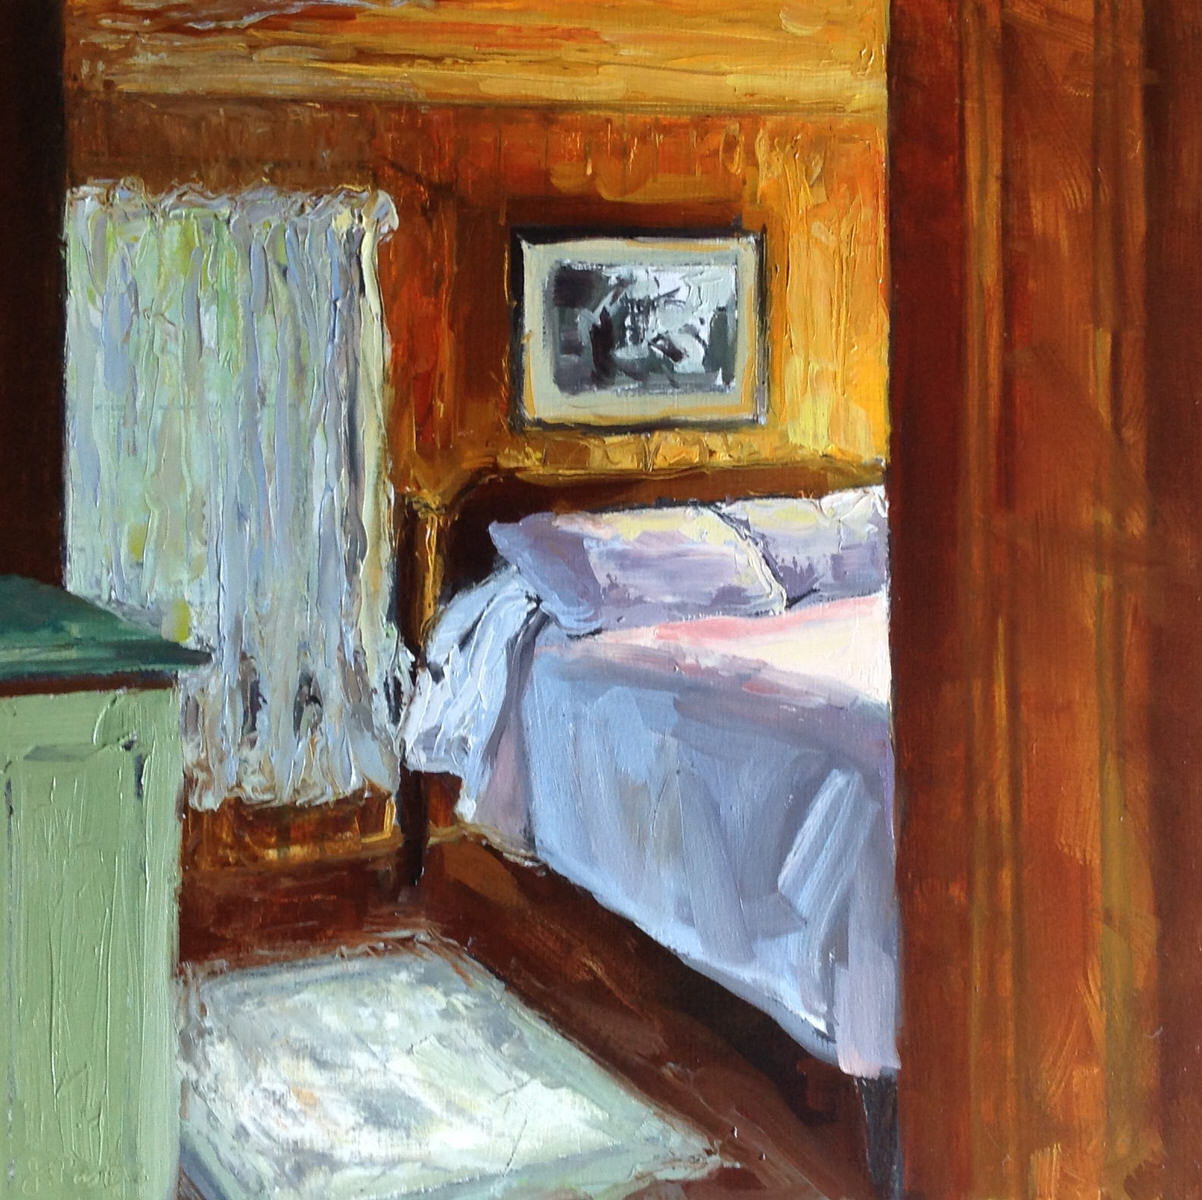 Cottage Memories #1